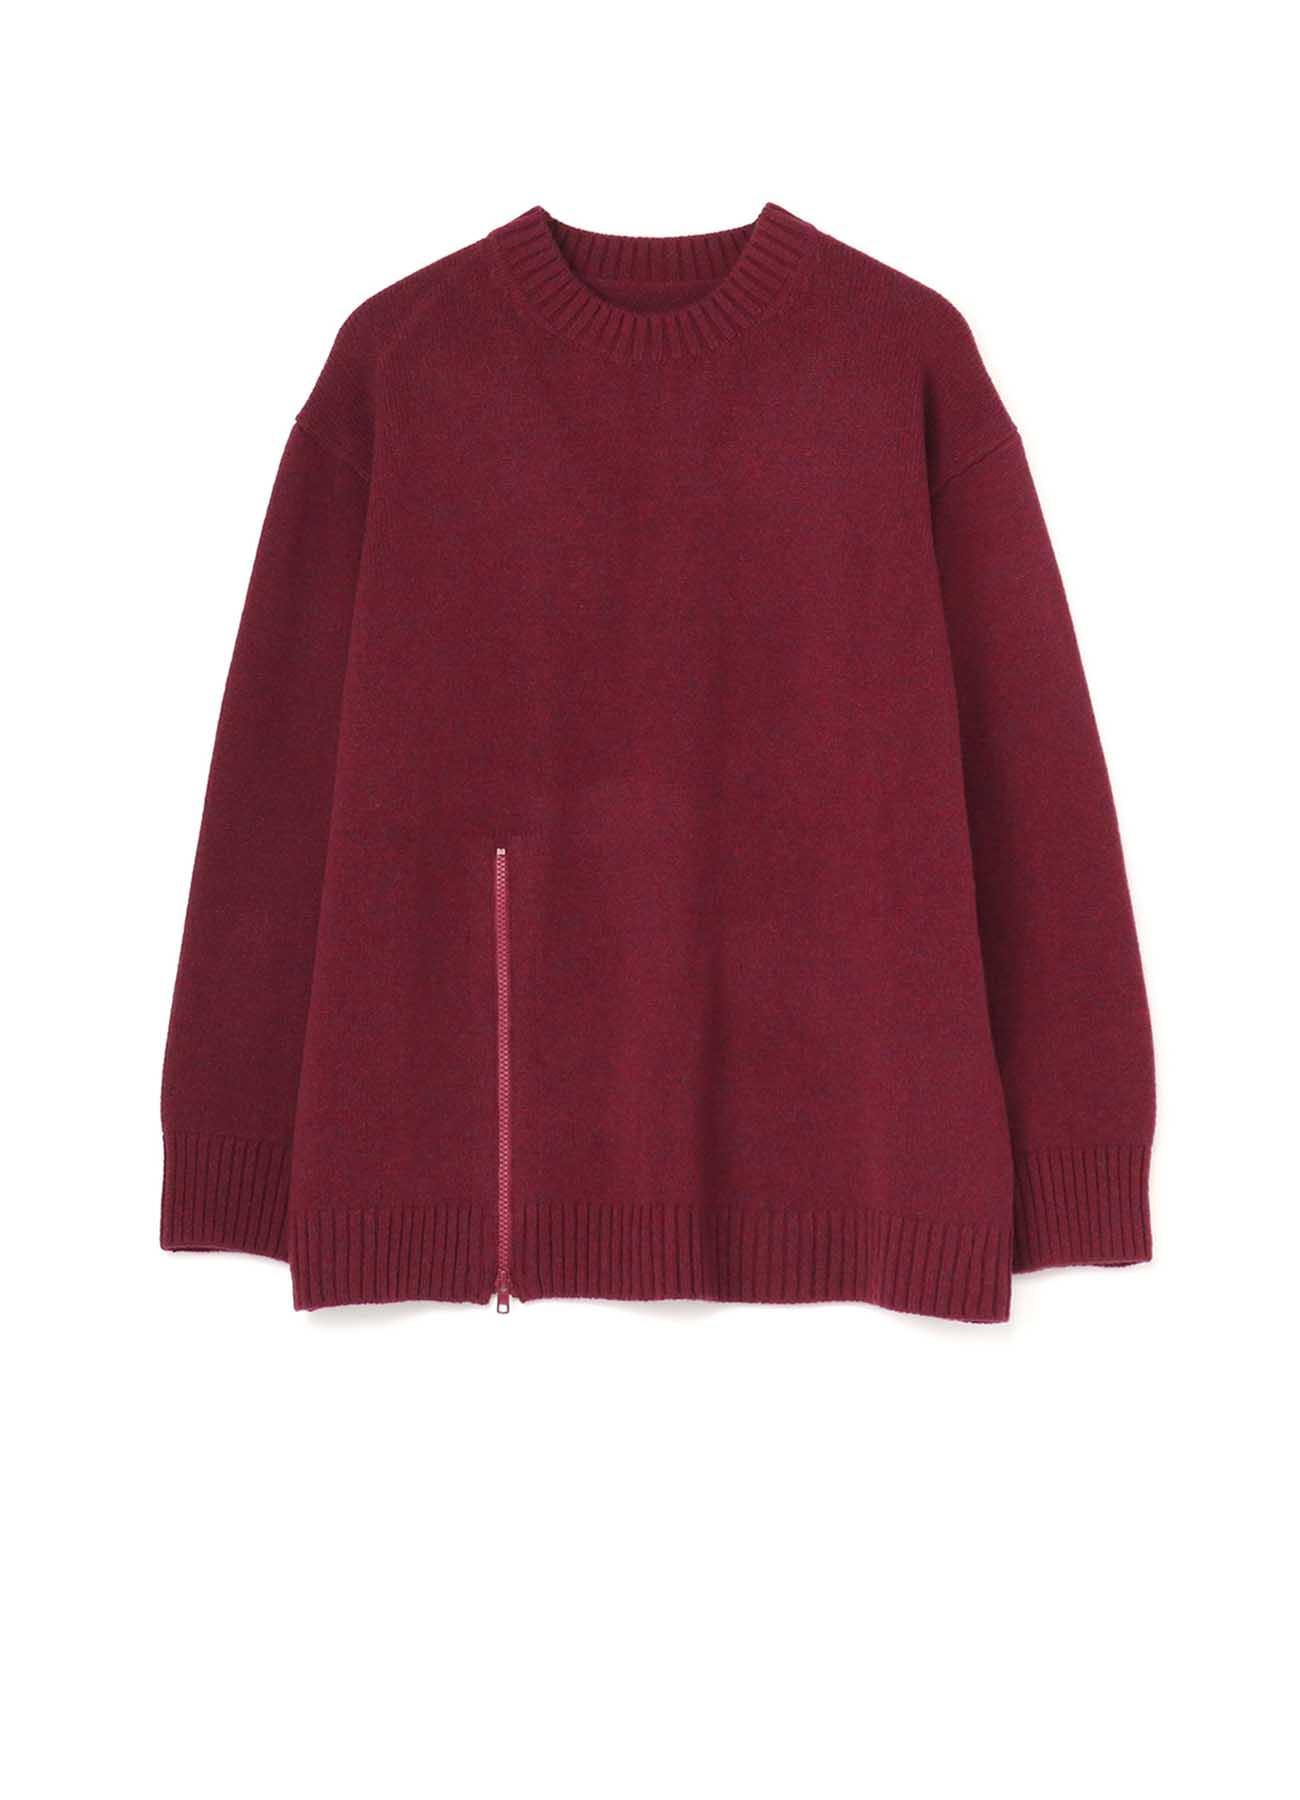 SLH Knit Round Neck Zipper